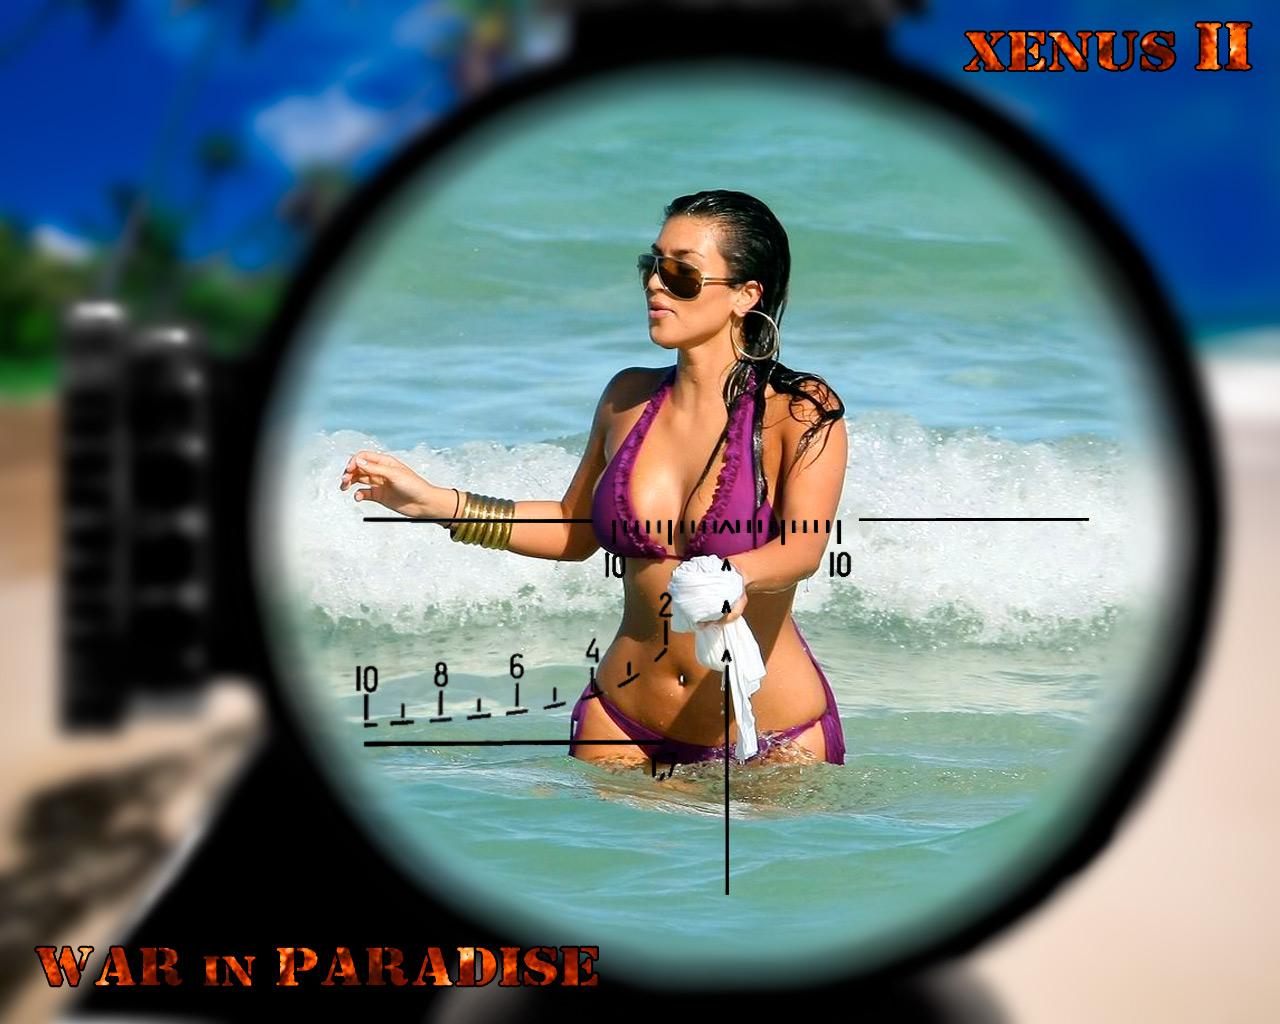 свд 2 - White Gold: War in Paradise